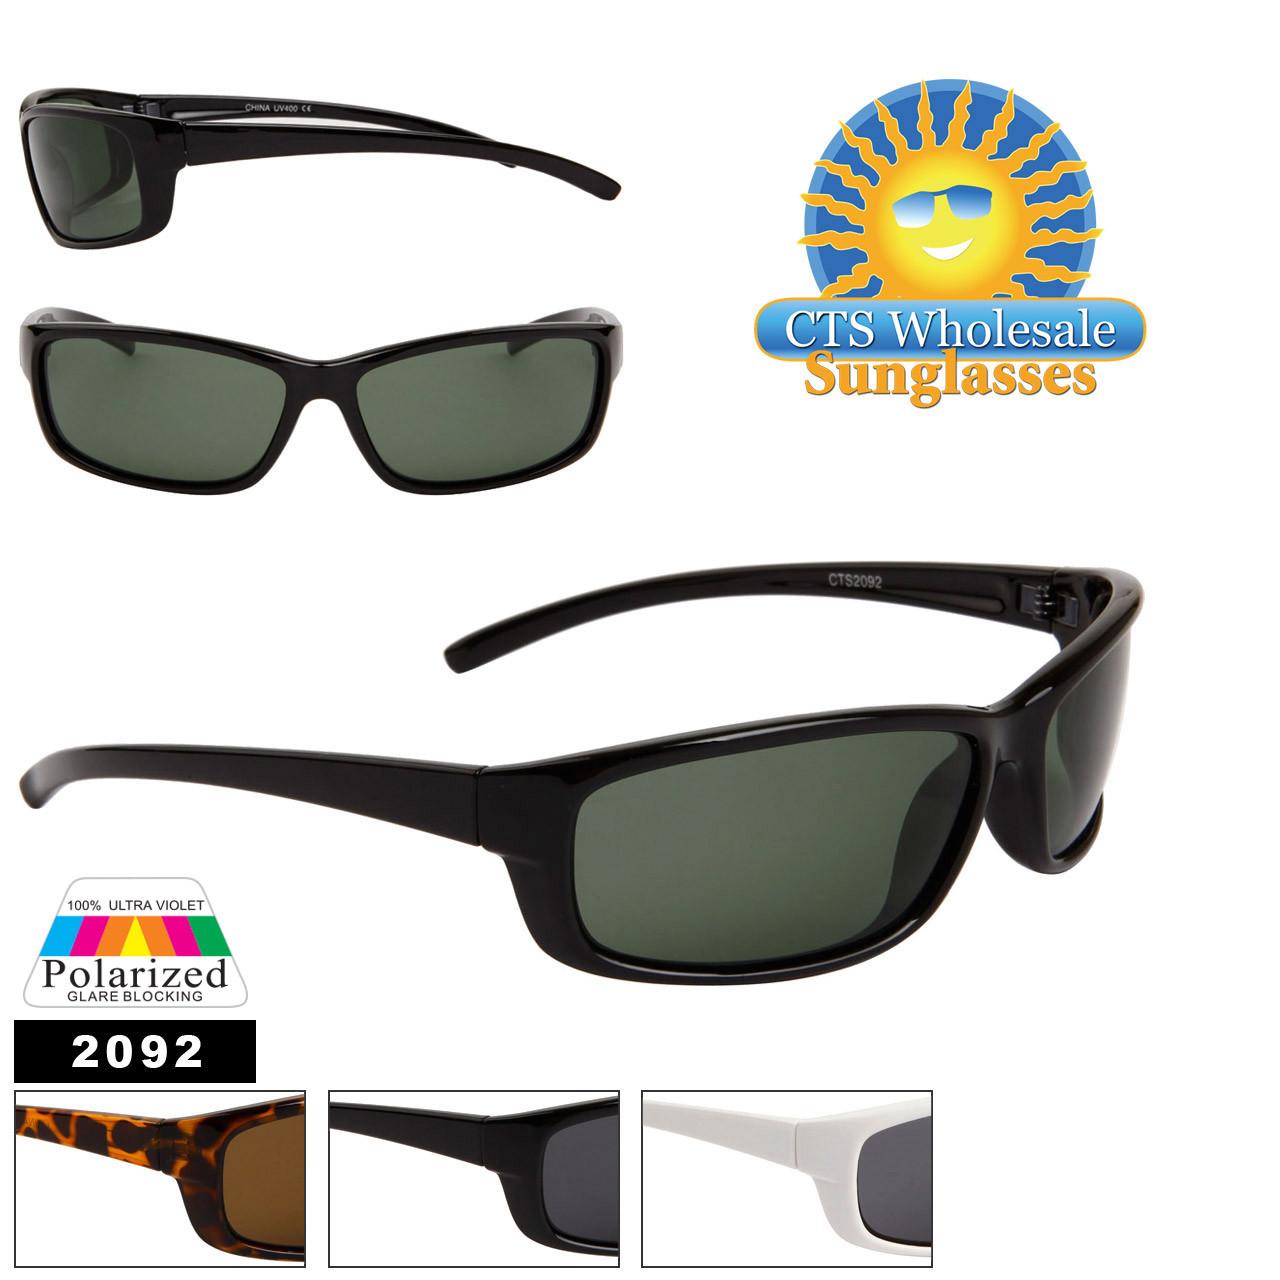 Polarized Sports Sunglasses 2092